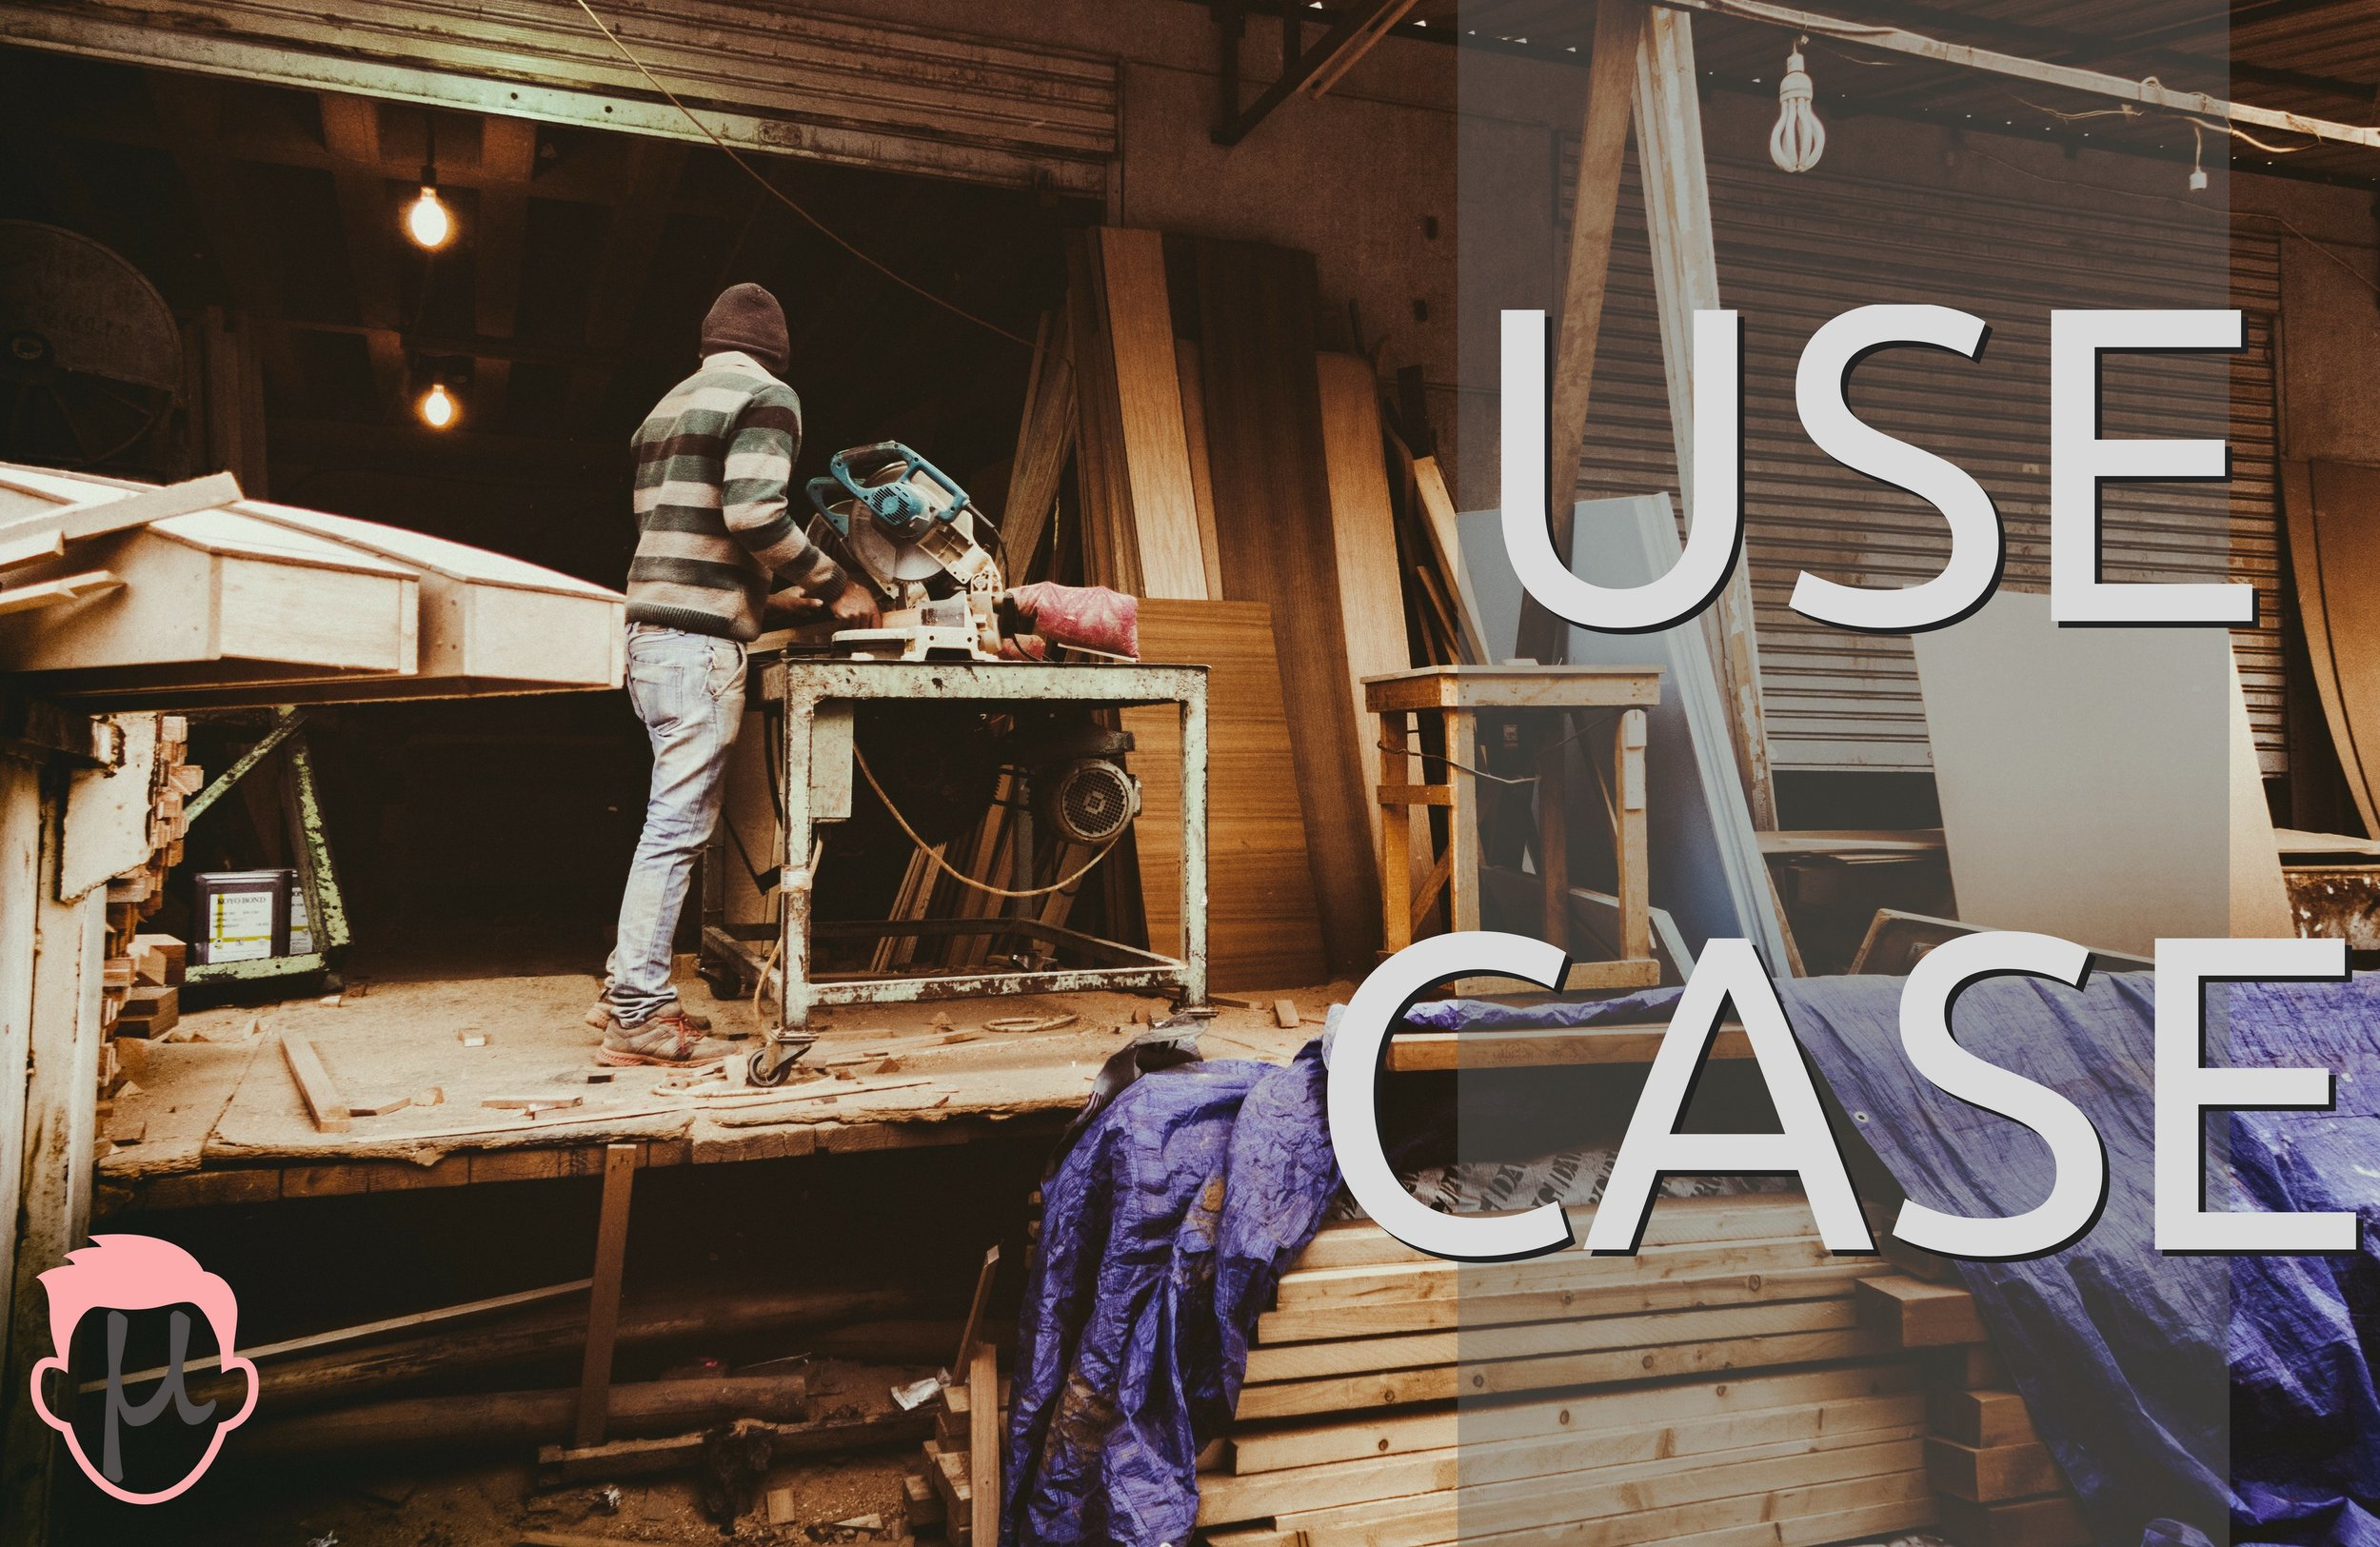 USE CASE.jpg